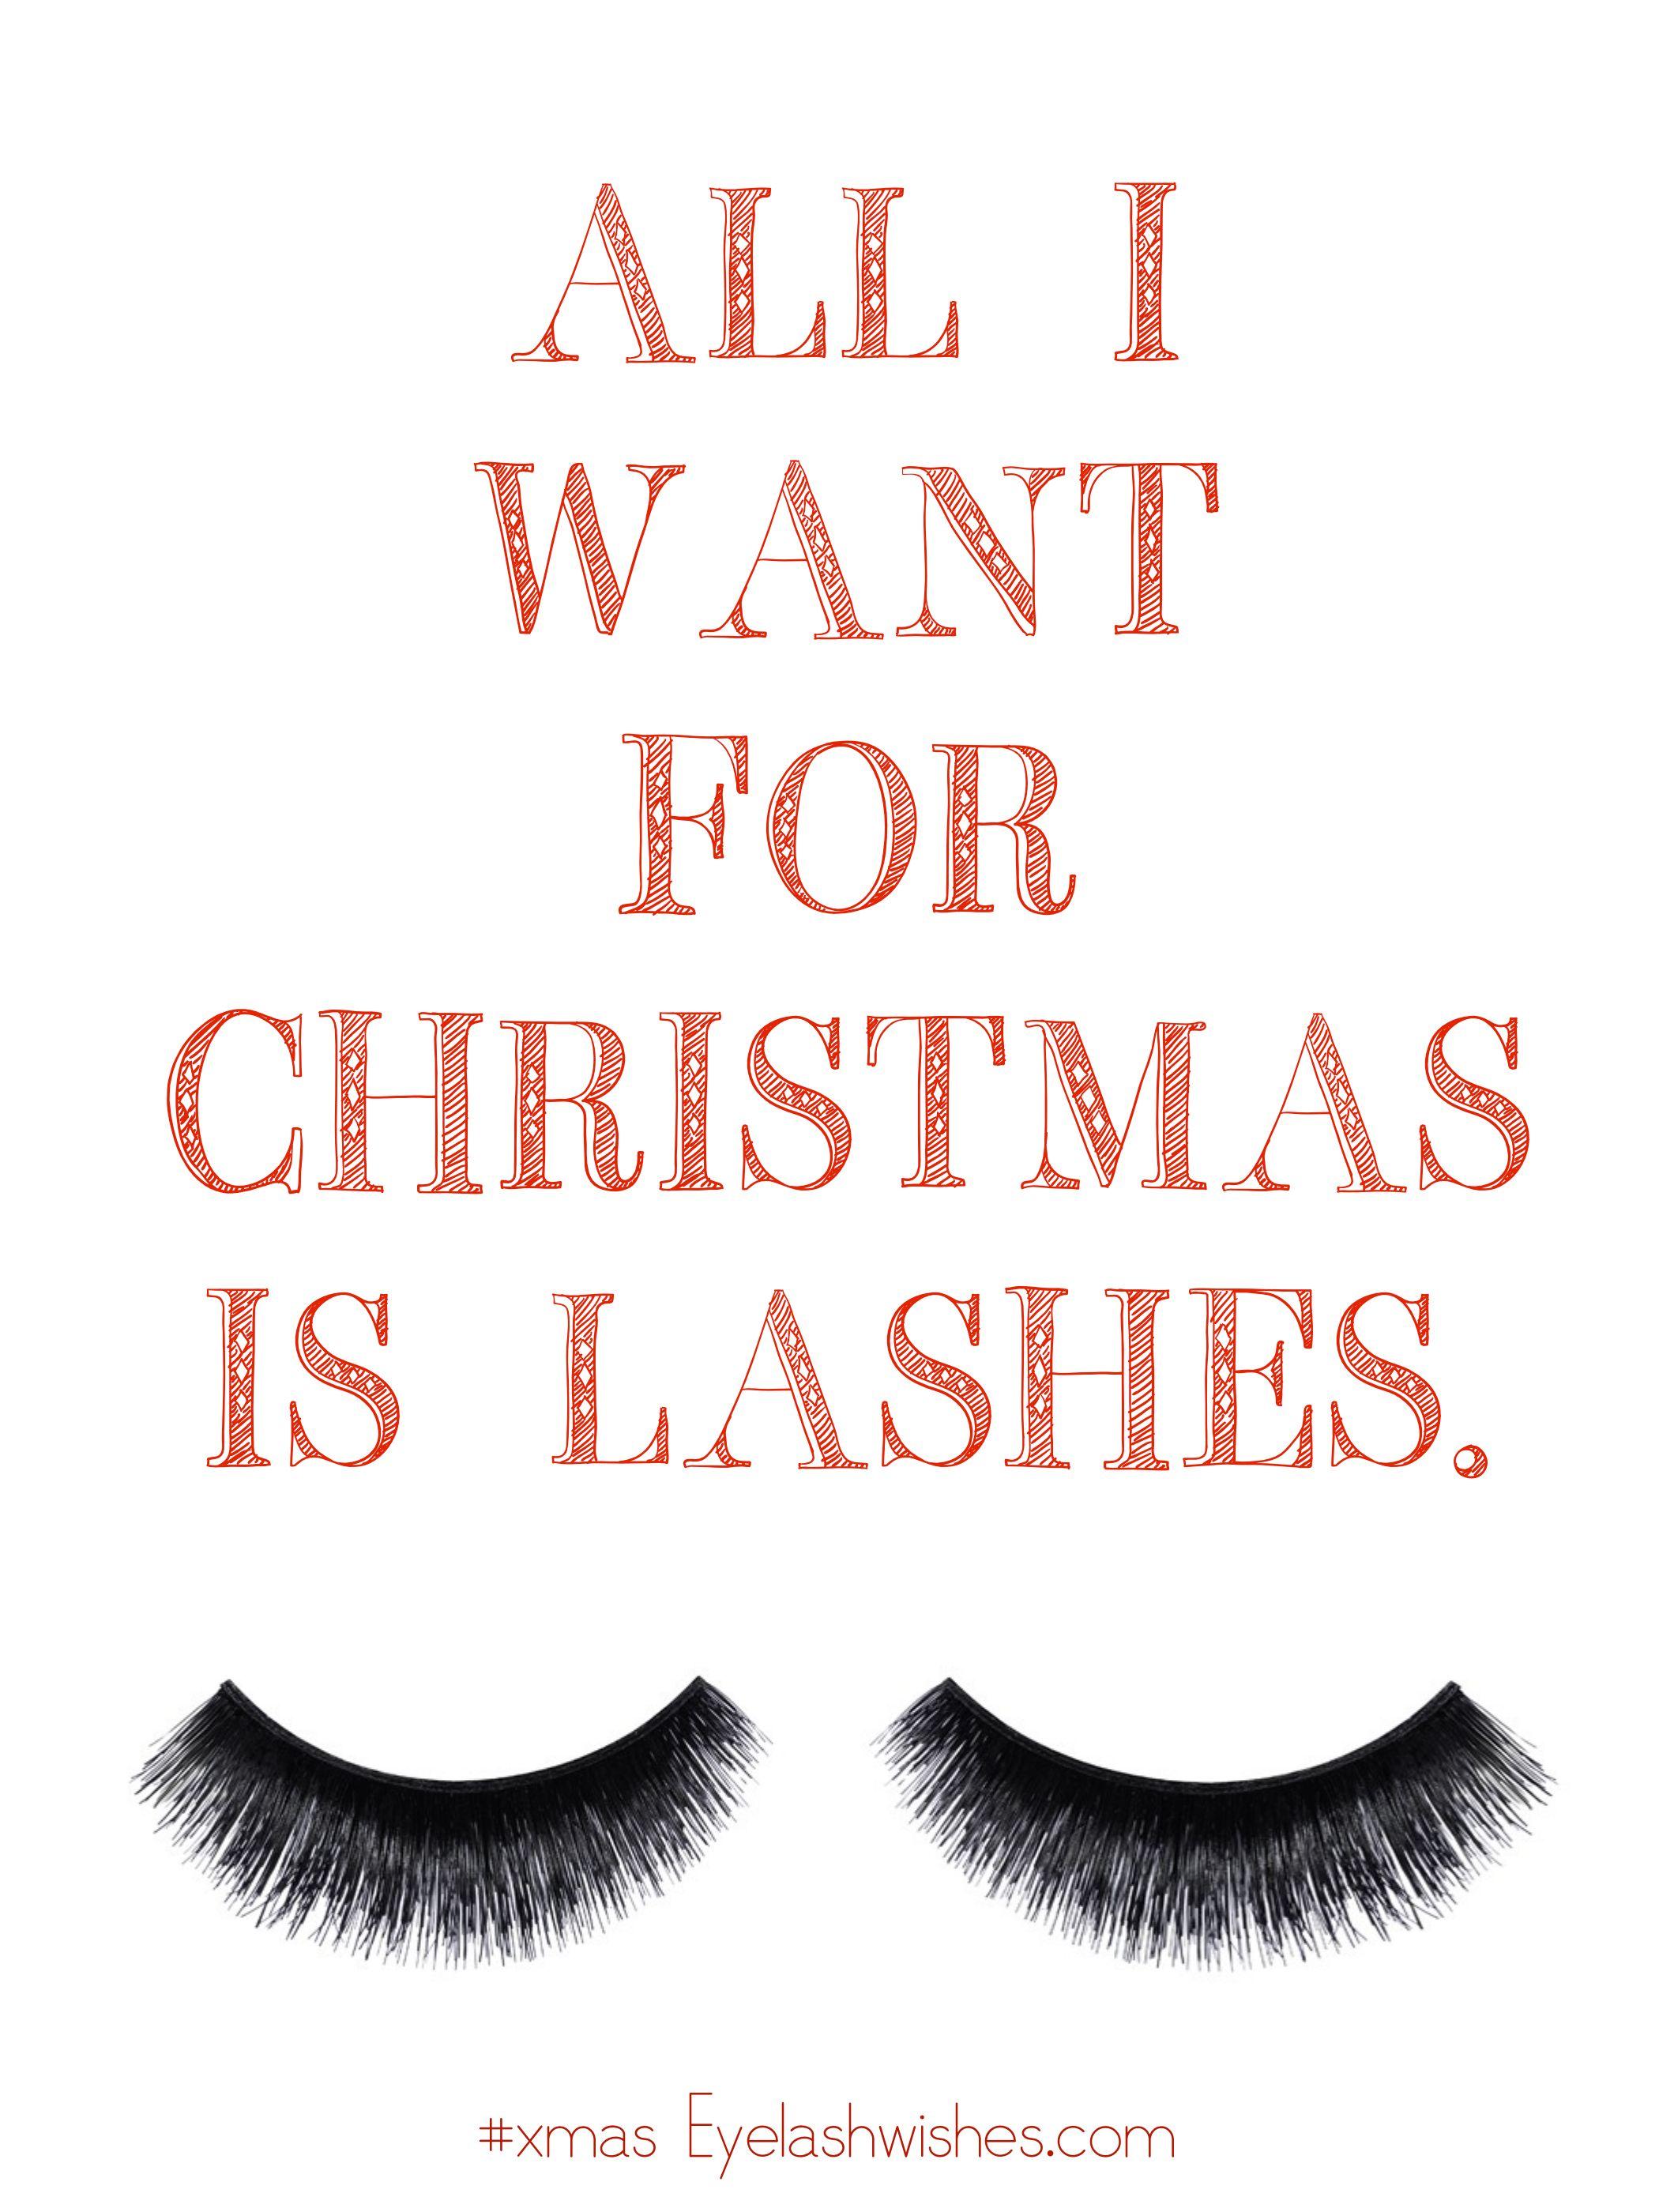 All I Want For Christmas Is Lashes Eyelashes Lashes Christmas Xmas Http Www Eyelashwishes Co Uk Lash Quotes Eyelash Extensions Lashes